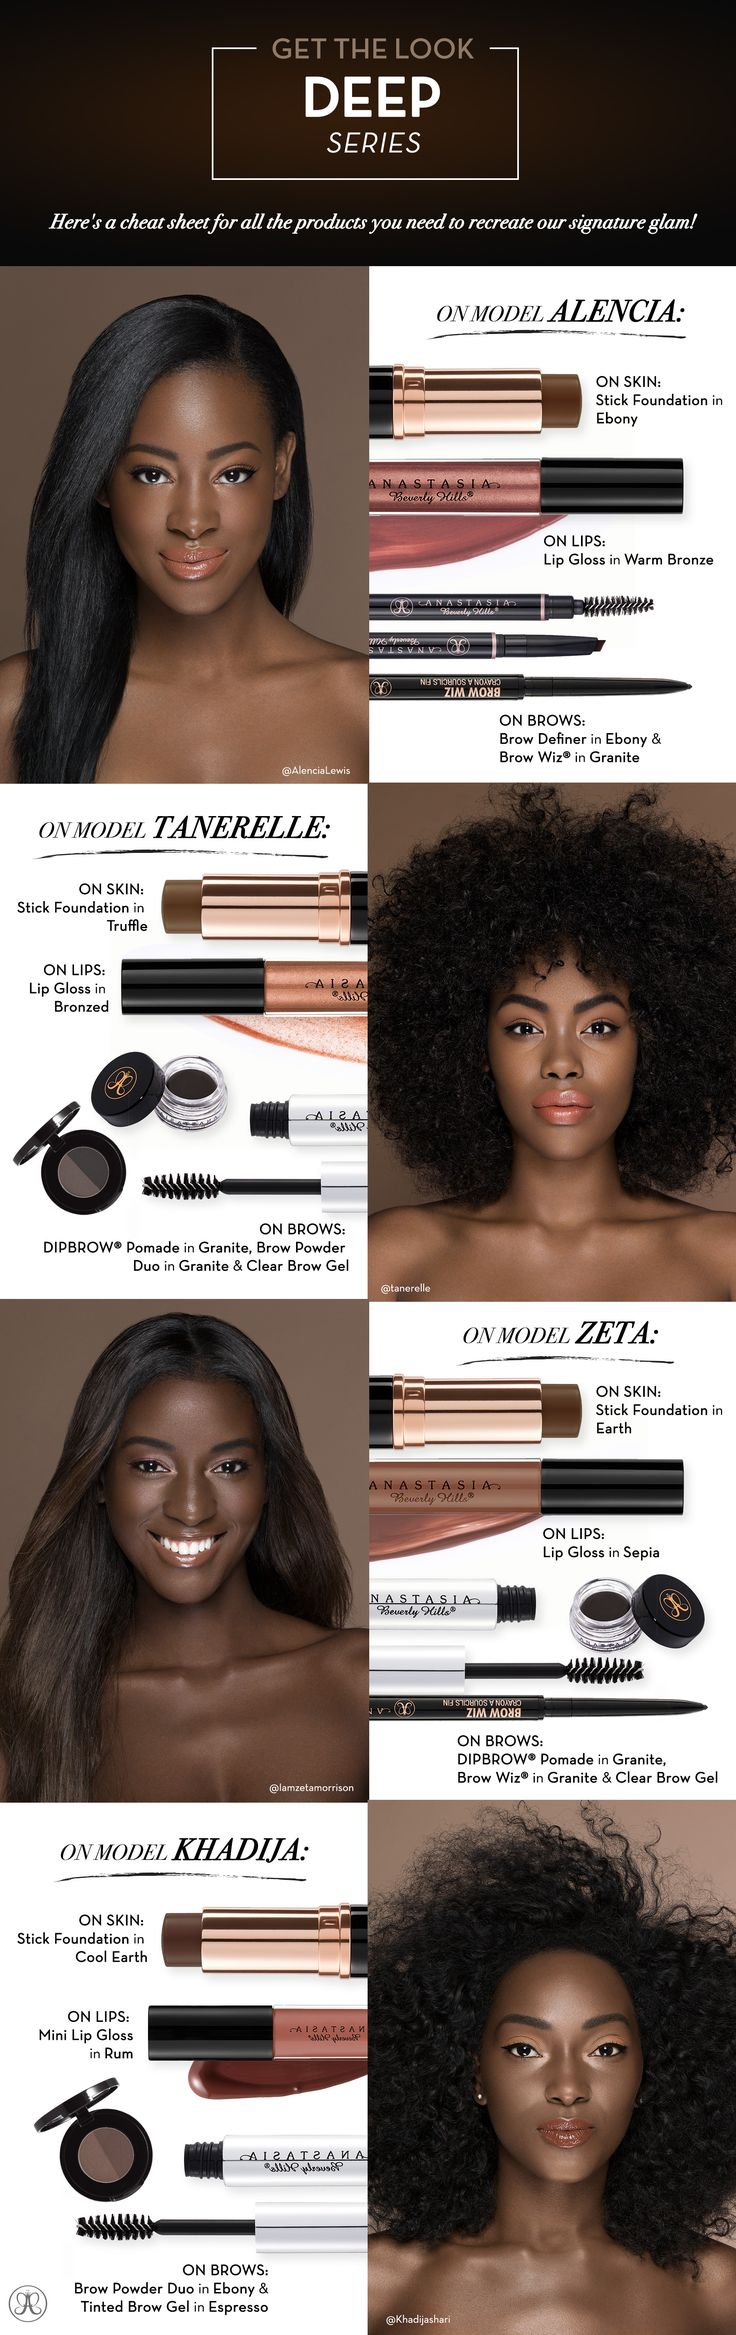 On model Alencia: On skin: Stick Foundation in Ebony. On lips: lip gloss in warm…